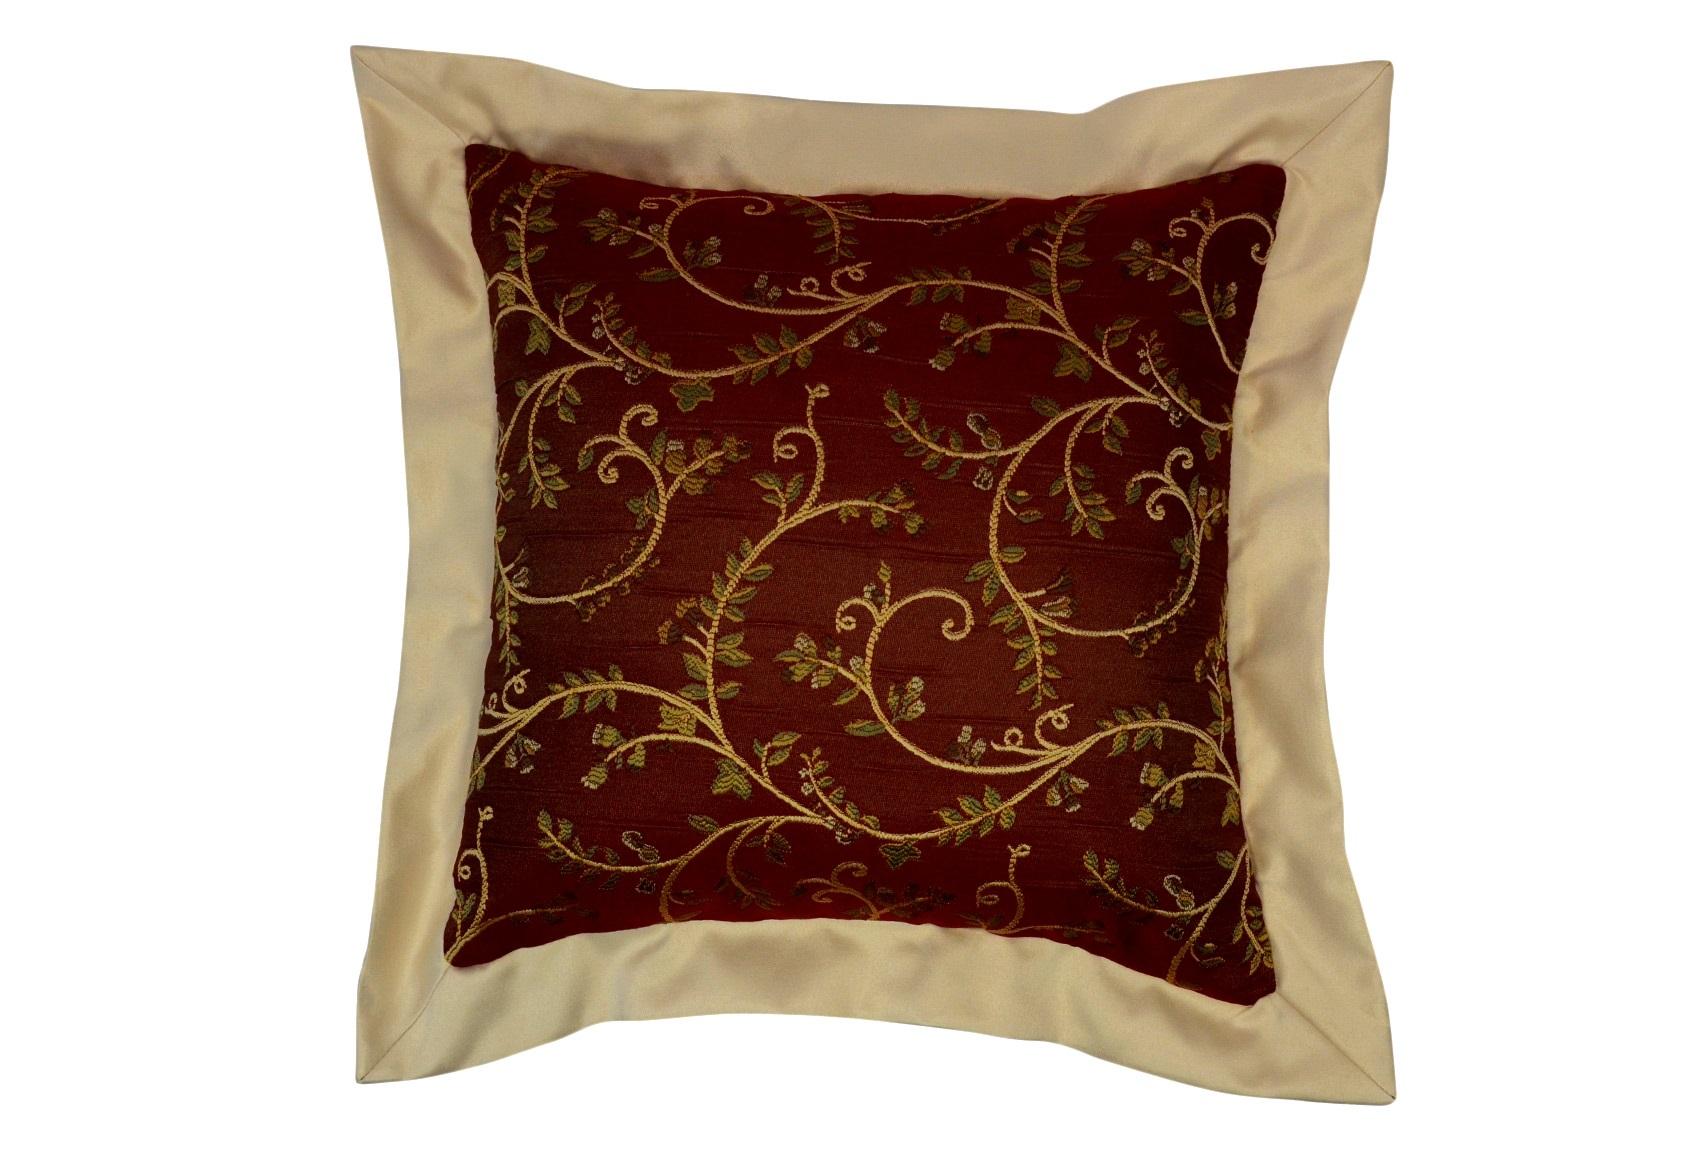 Подушка Arabelle BordoКвадратные подушки и наволочки<br>Декоративная  подушка .Чехол съемный.<br><br>Material: Вискоза<br>Ширина см: 50<br>Высота см: 50<br>Глубина см: 15